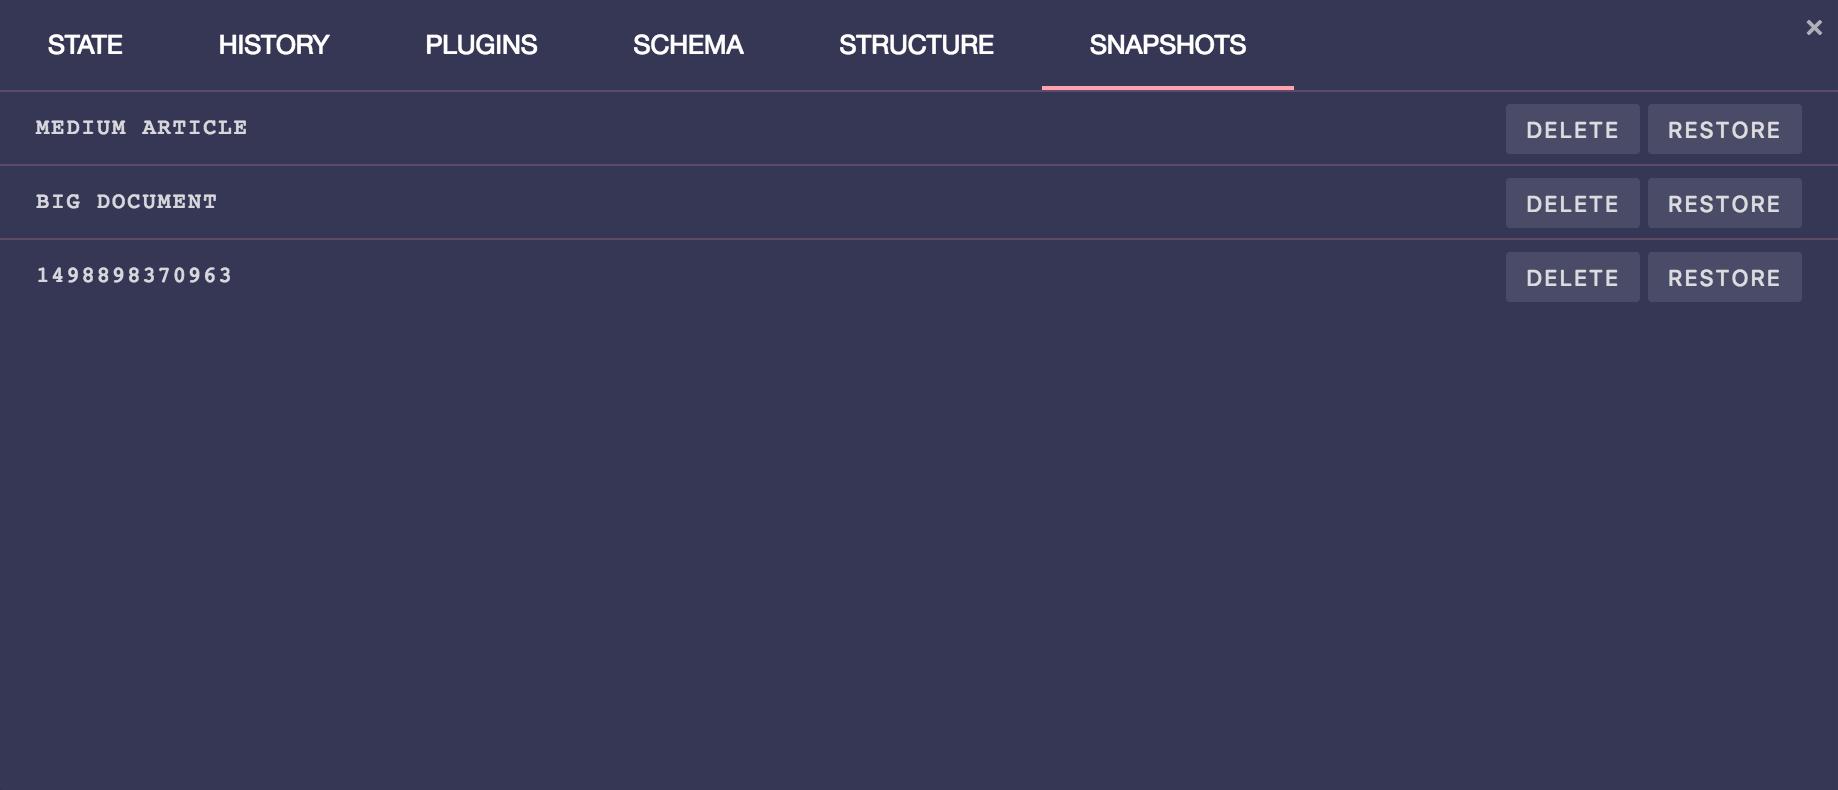 prosemirror-dev-tools snapshots tab